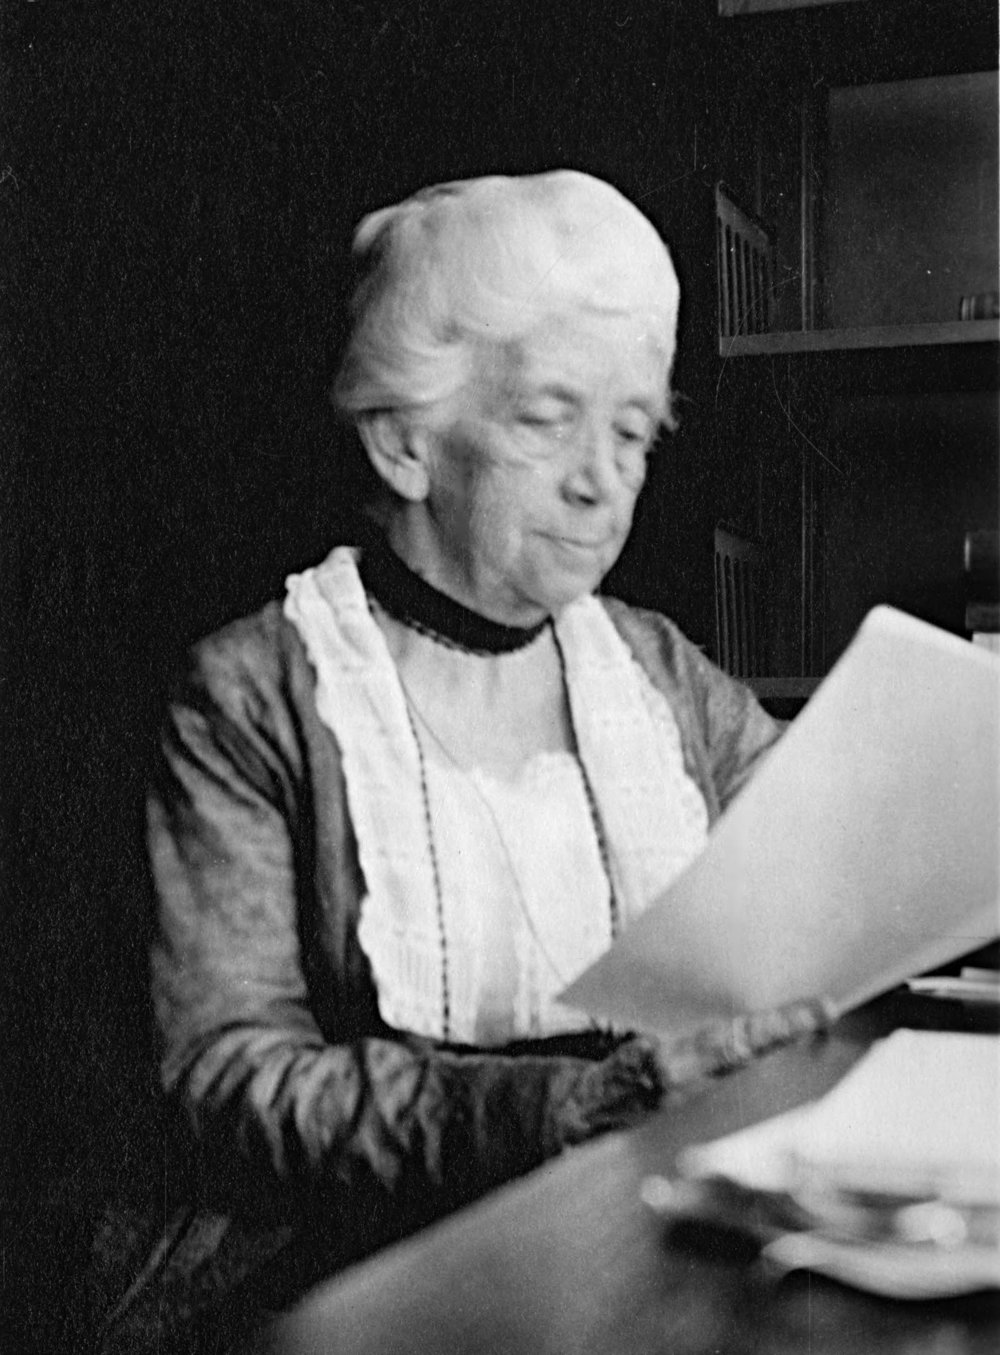 Christine Ladd Franklin: A Woman Advancing Women